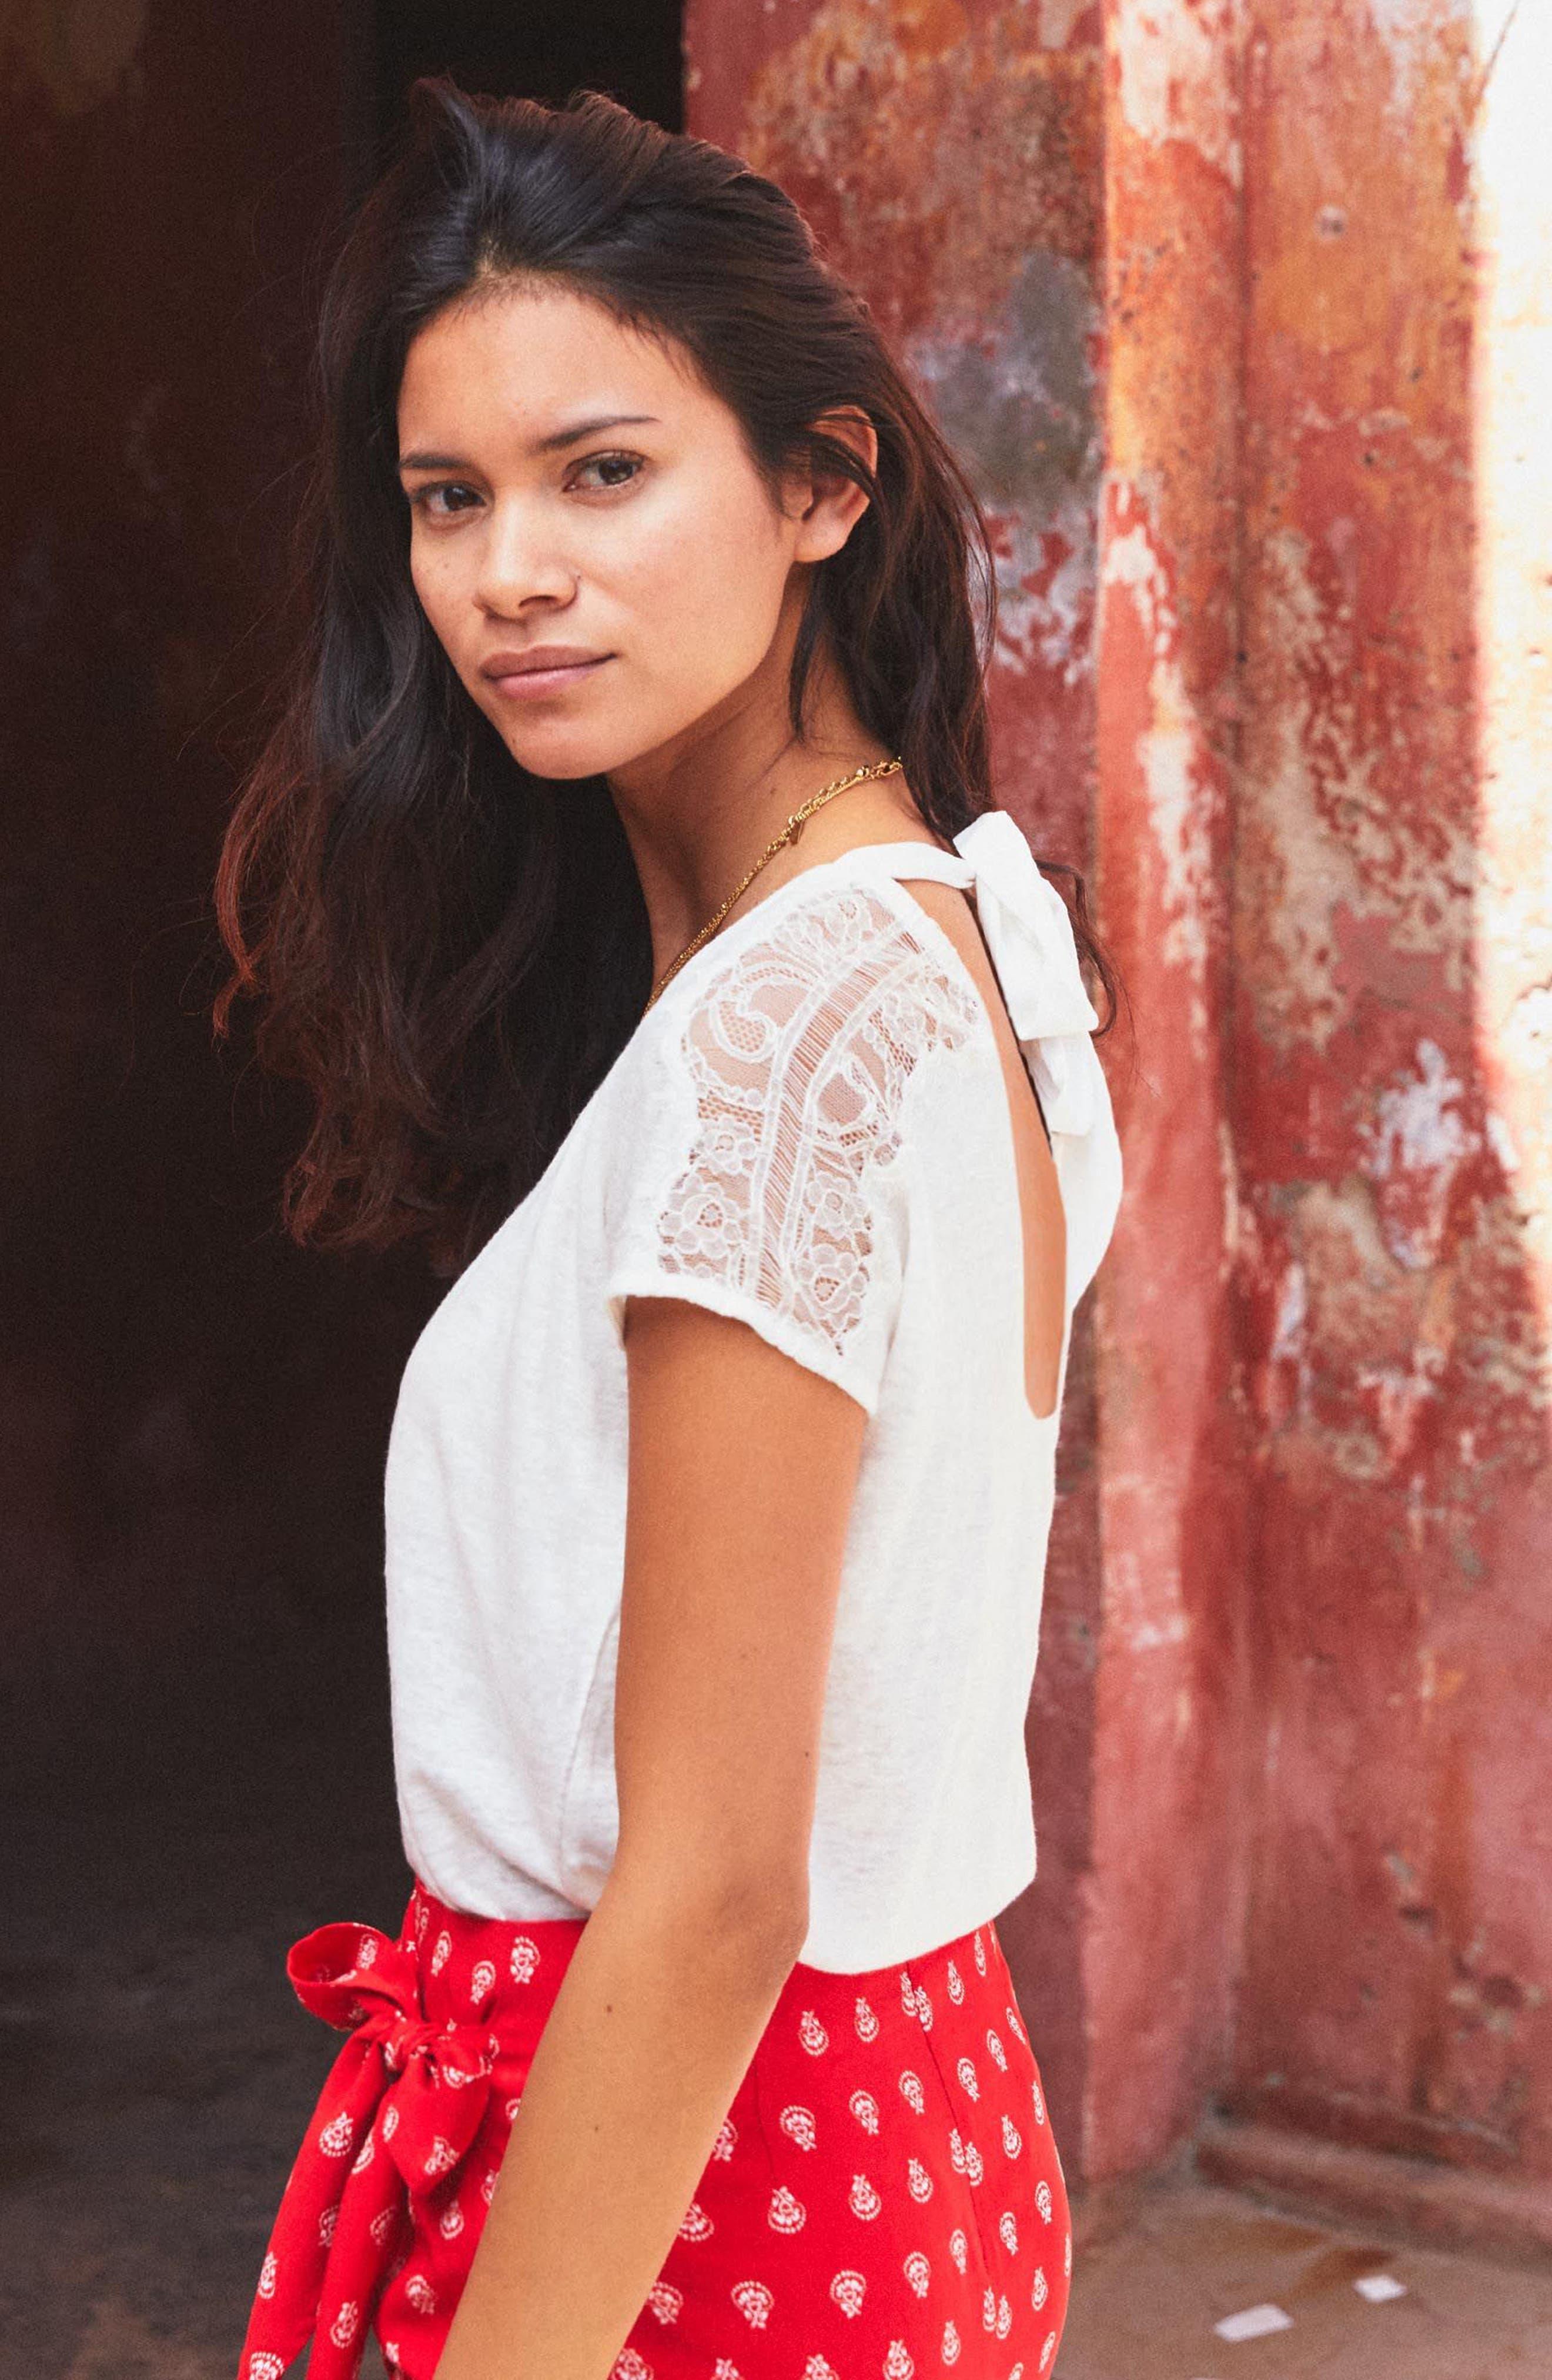 Livia Lace Shoulder Back Tie Linen Tee,                             Alternate thumbnail 2, color,                             Off White